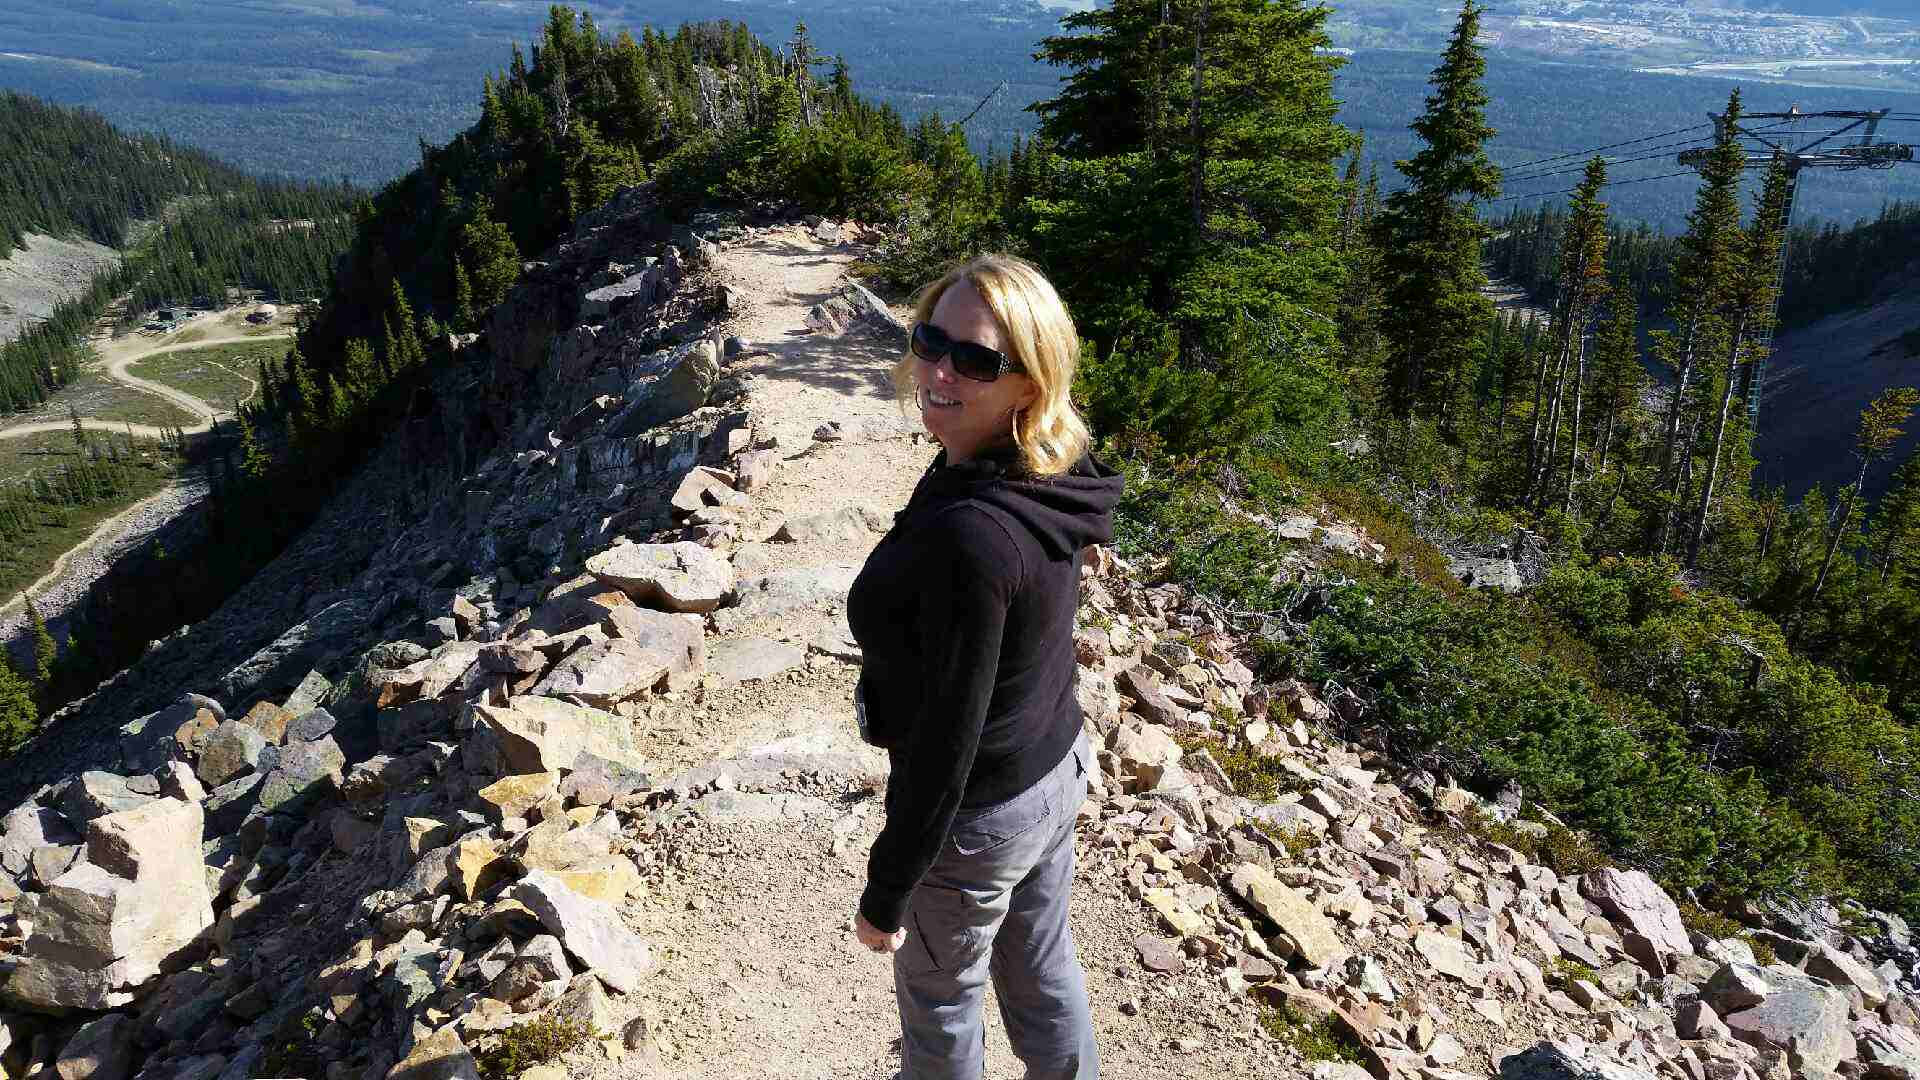 Super Agent Jennifer at 'Kicking Horse' in Golden, BC